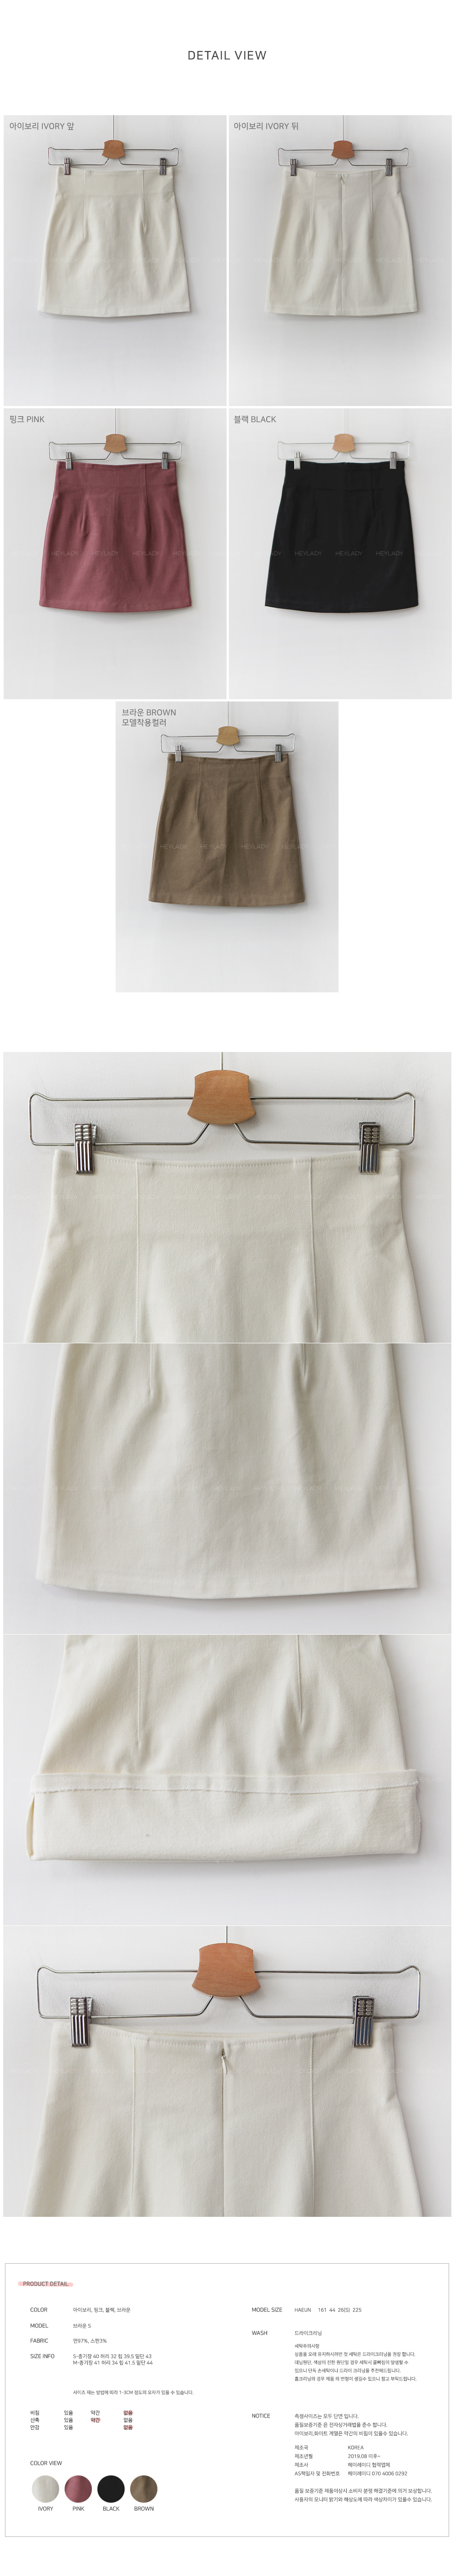 Main Fleece-lined skirt